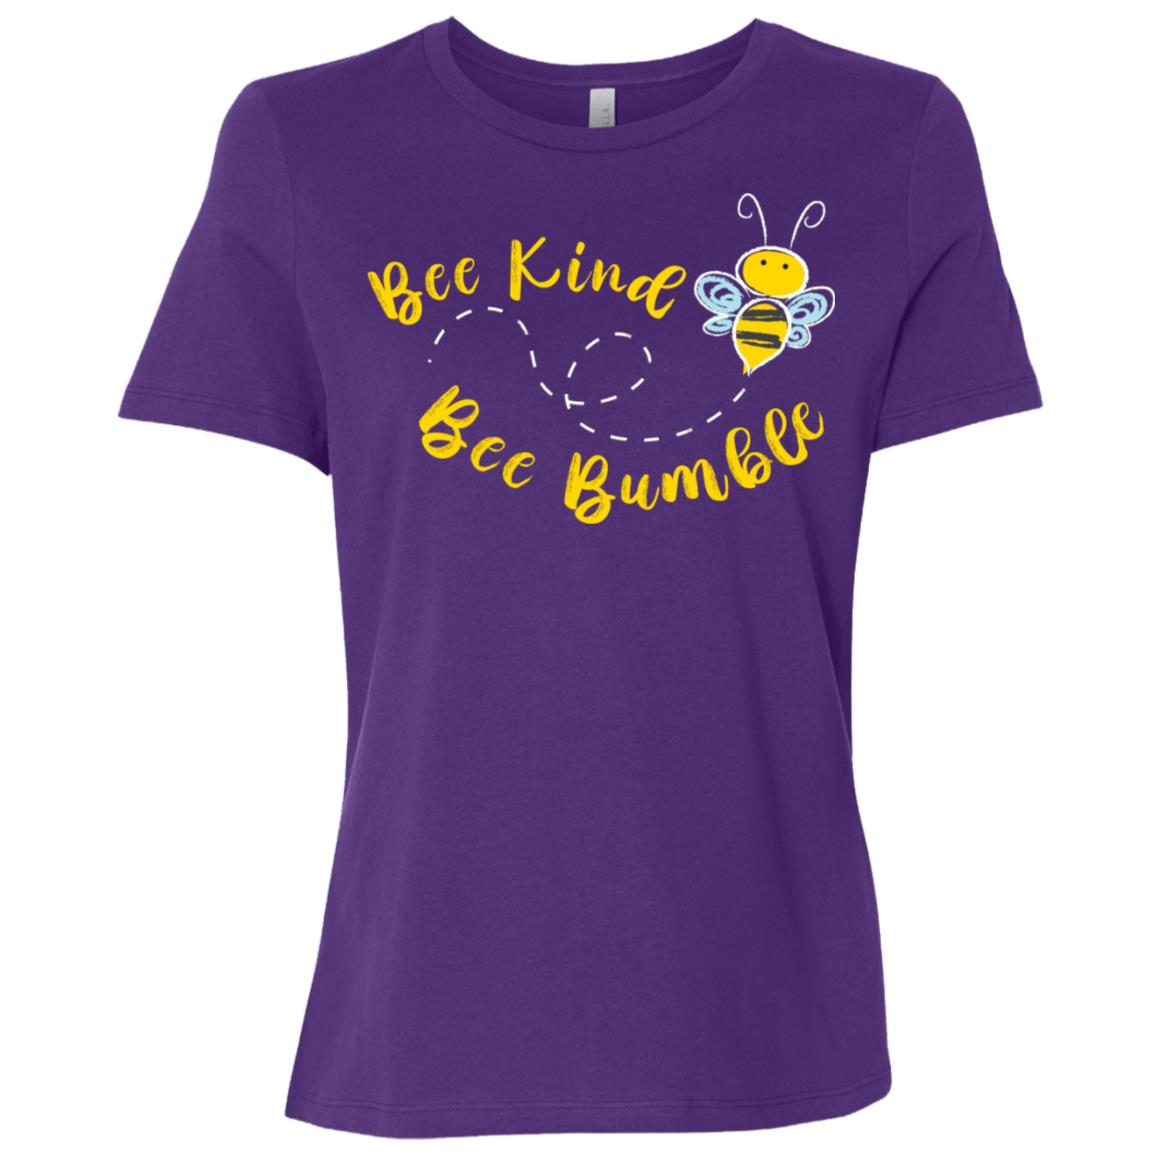 Bee kind Cute Bumble Bee Kindness Long -1 Women Short Sleeve T-Shirt